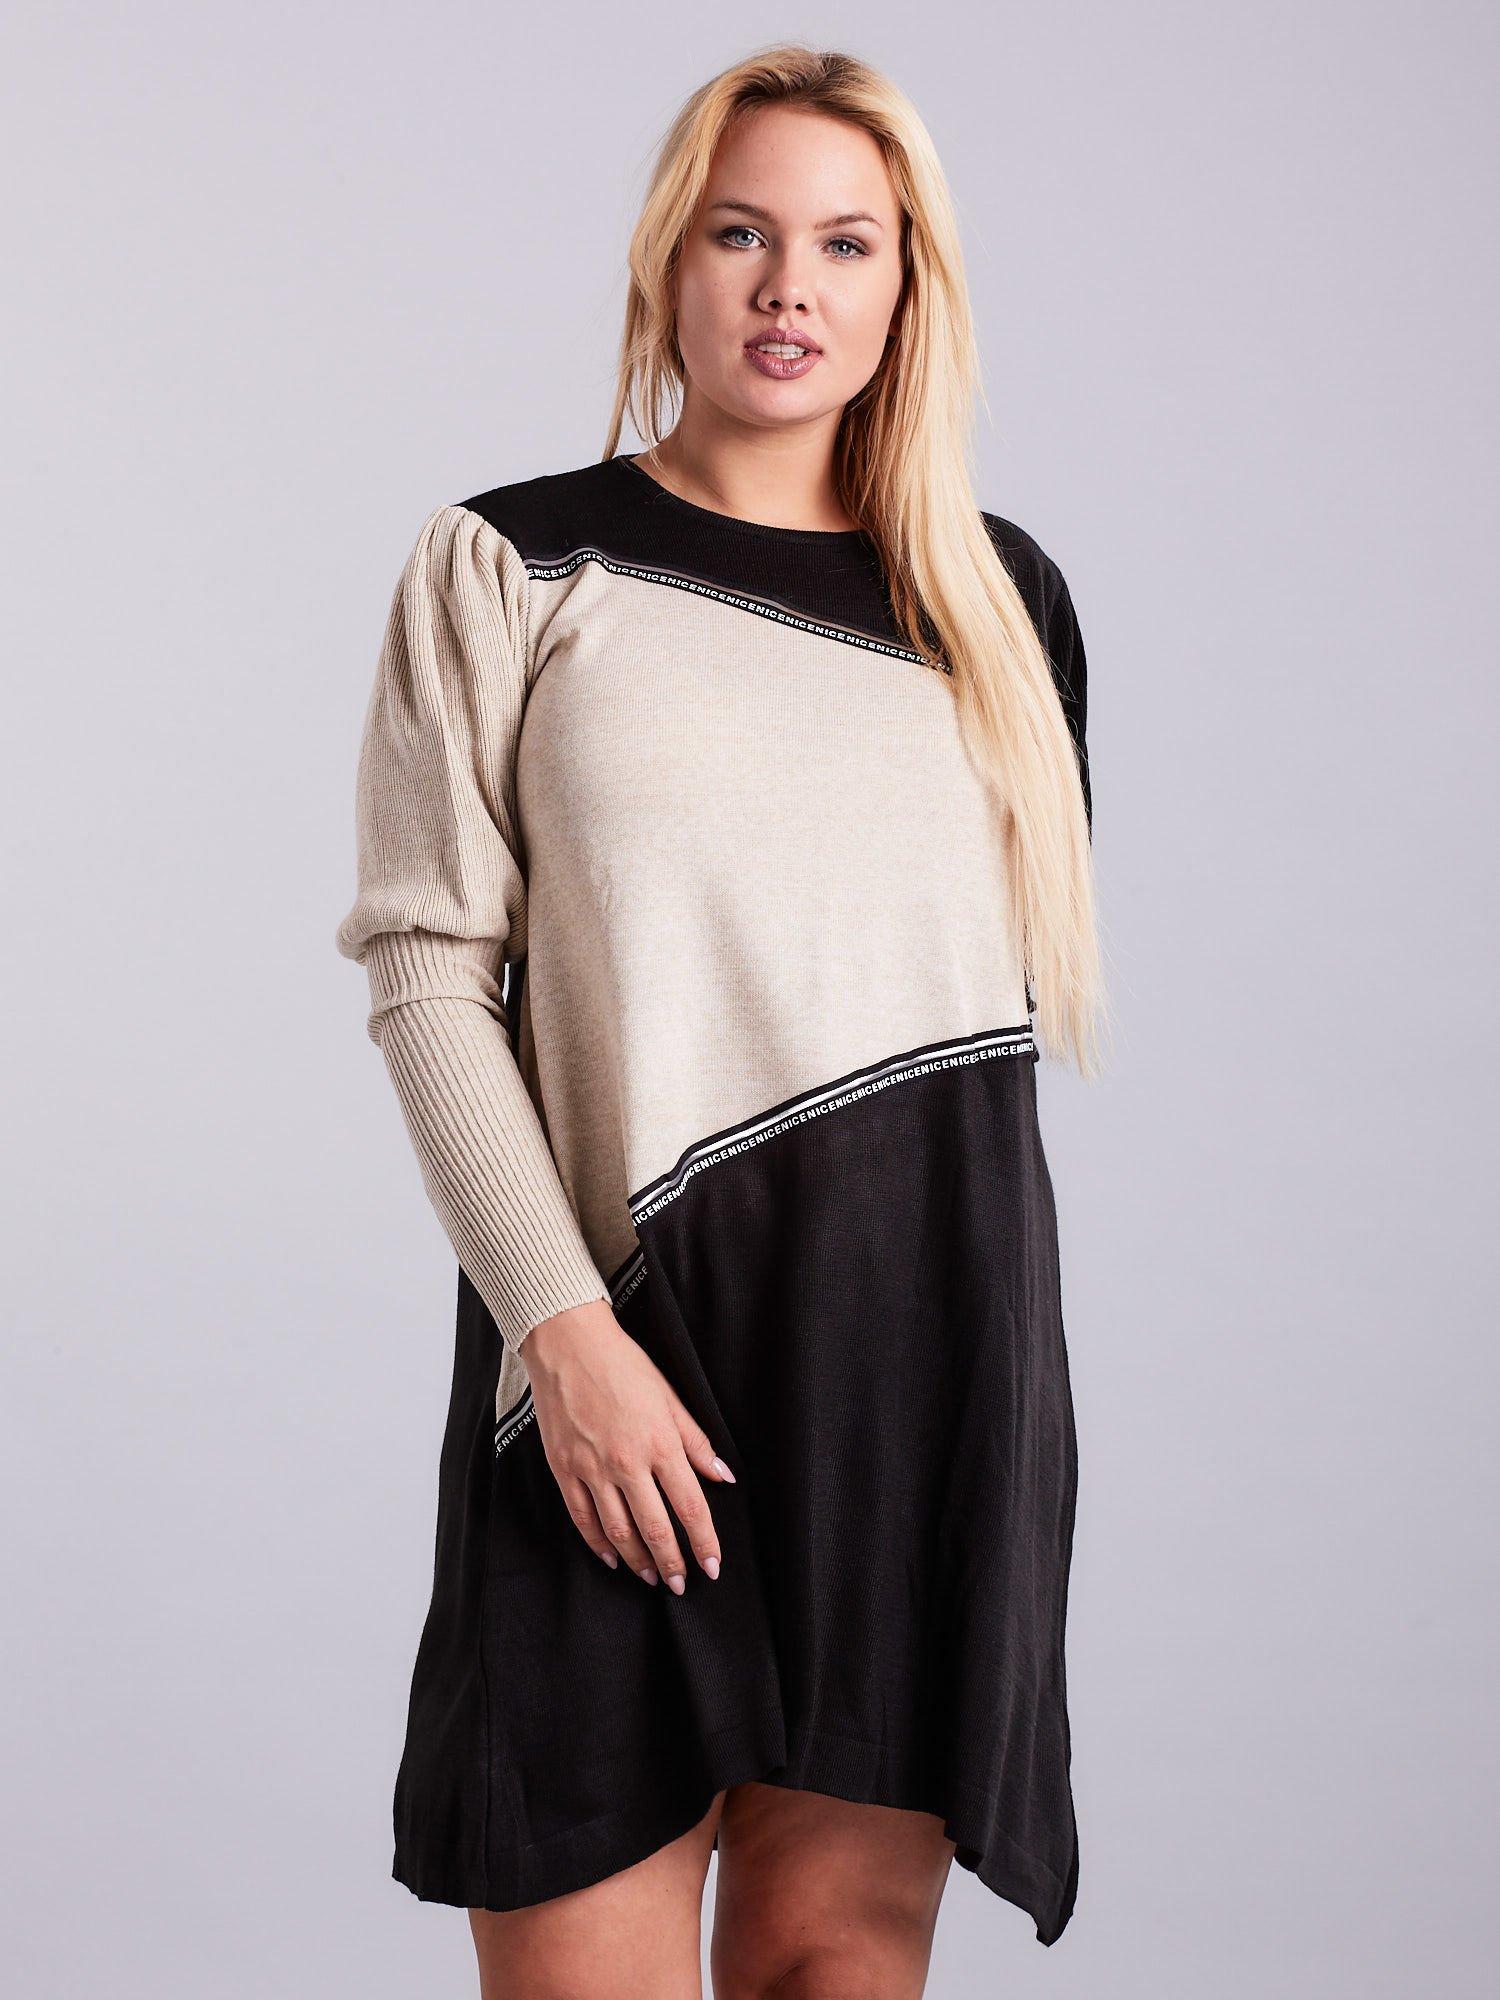 35e929b0a6 Czarno-beżowa sukienka dzianinowa PLUS SIZE - Sukienka plus size ...